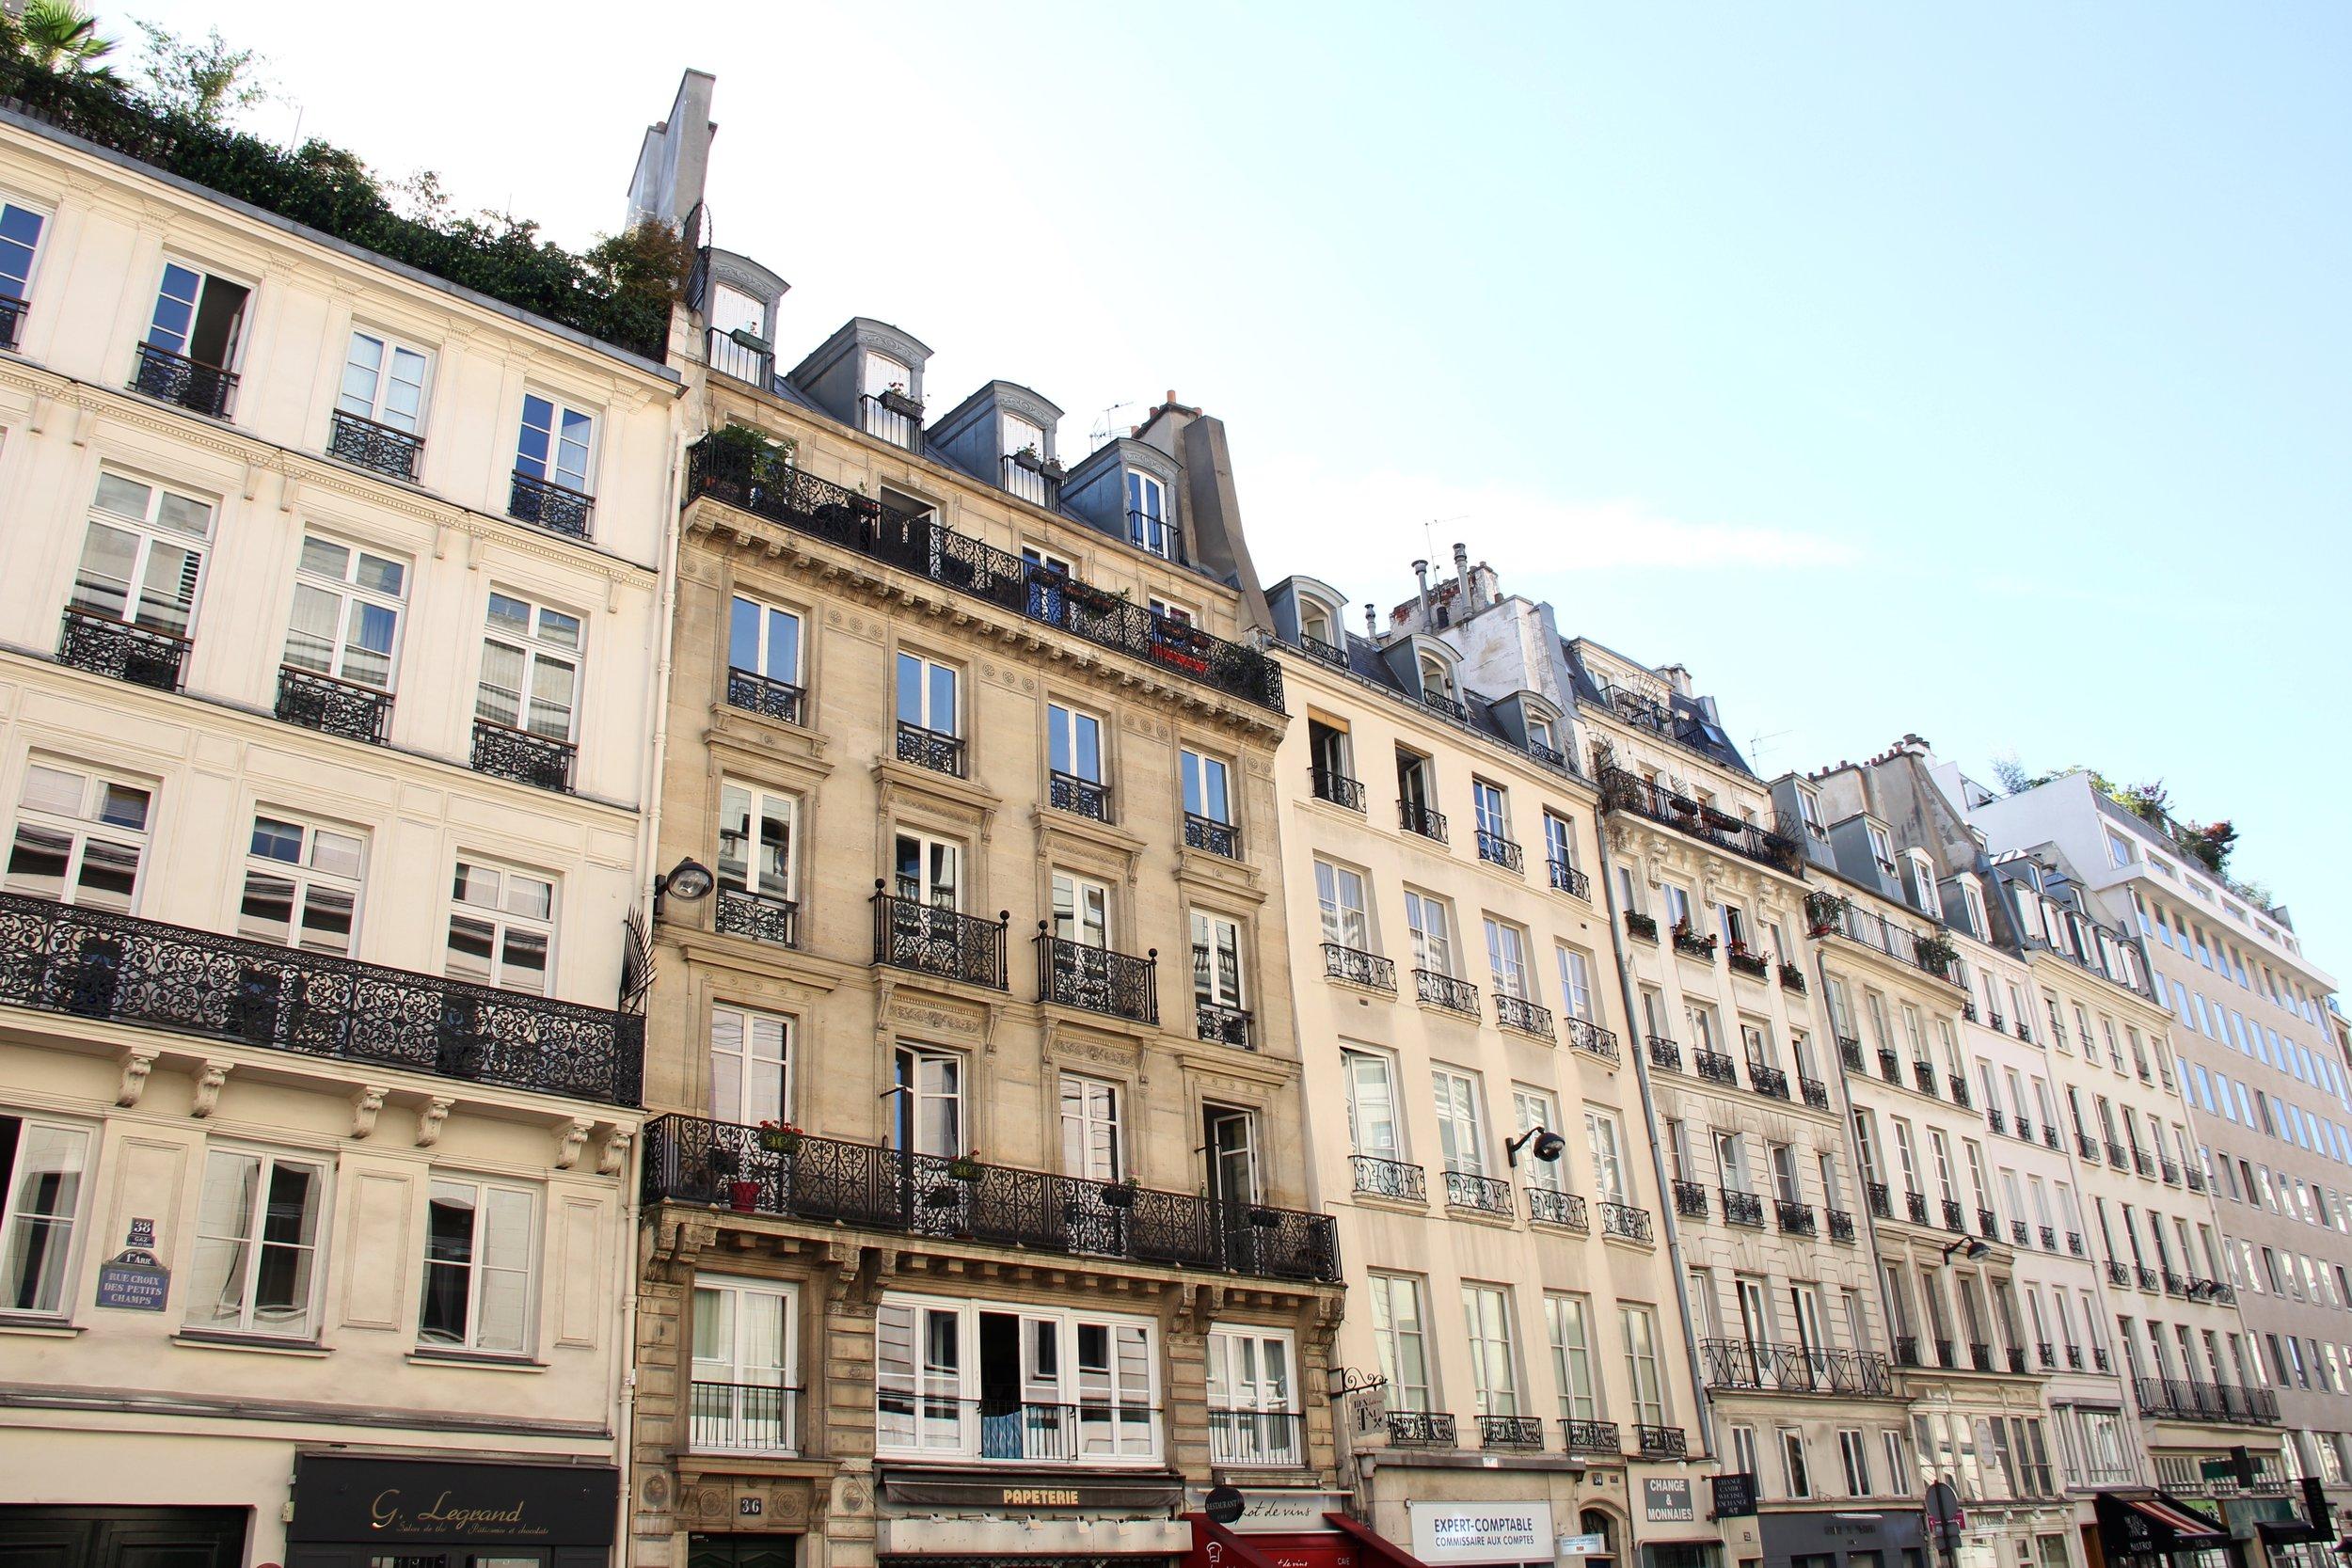 2016.09 Paris Edited 8169.jpg